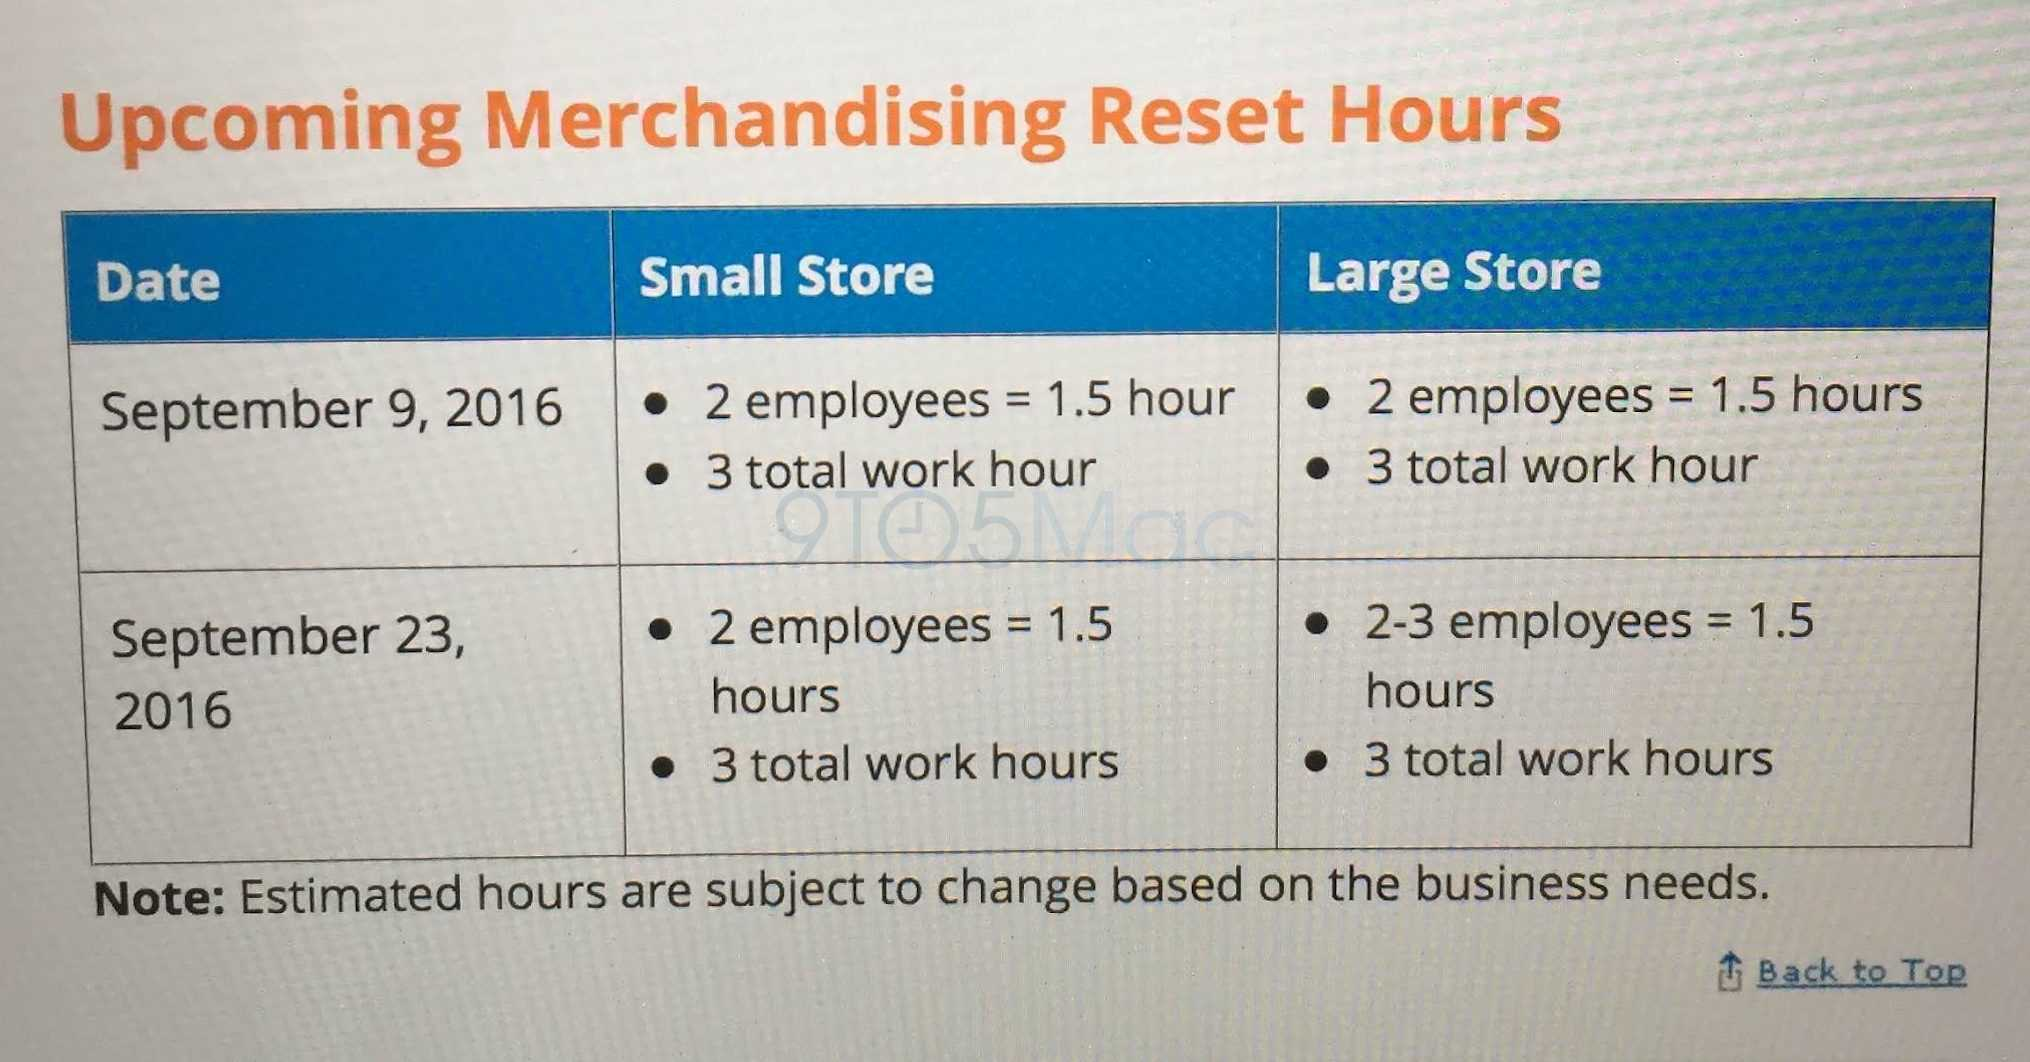 AT&T Merchandising reset